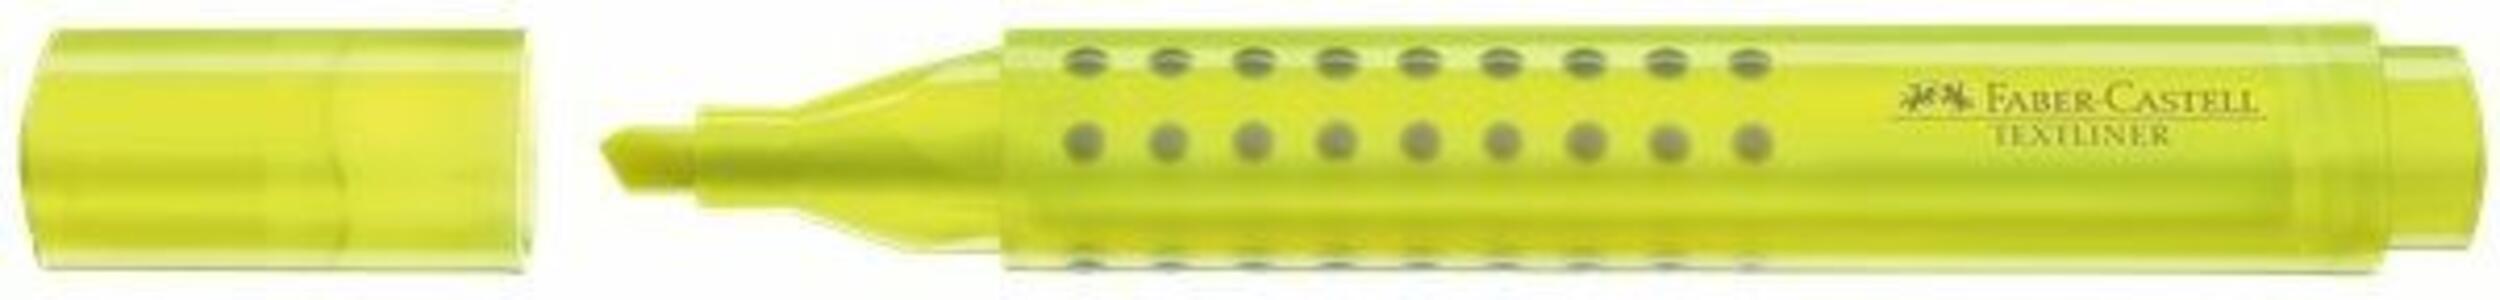 Evidenziatore Faber Castell Grip 1543 giallo punta 1-5 mm